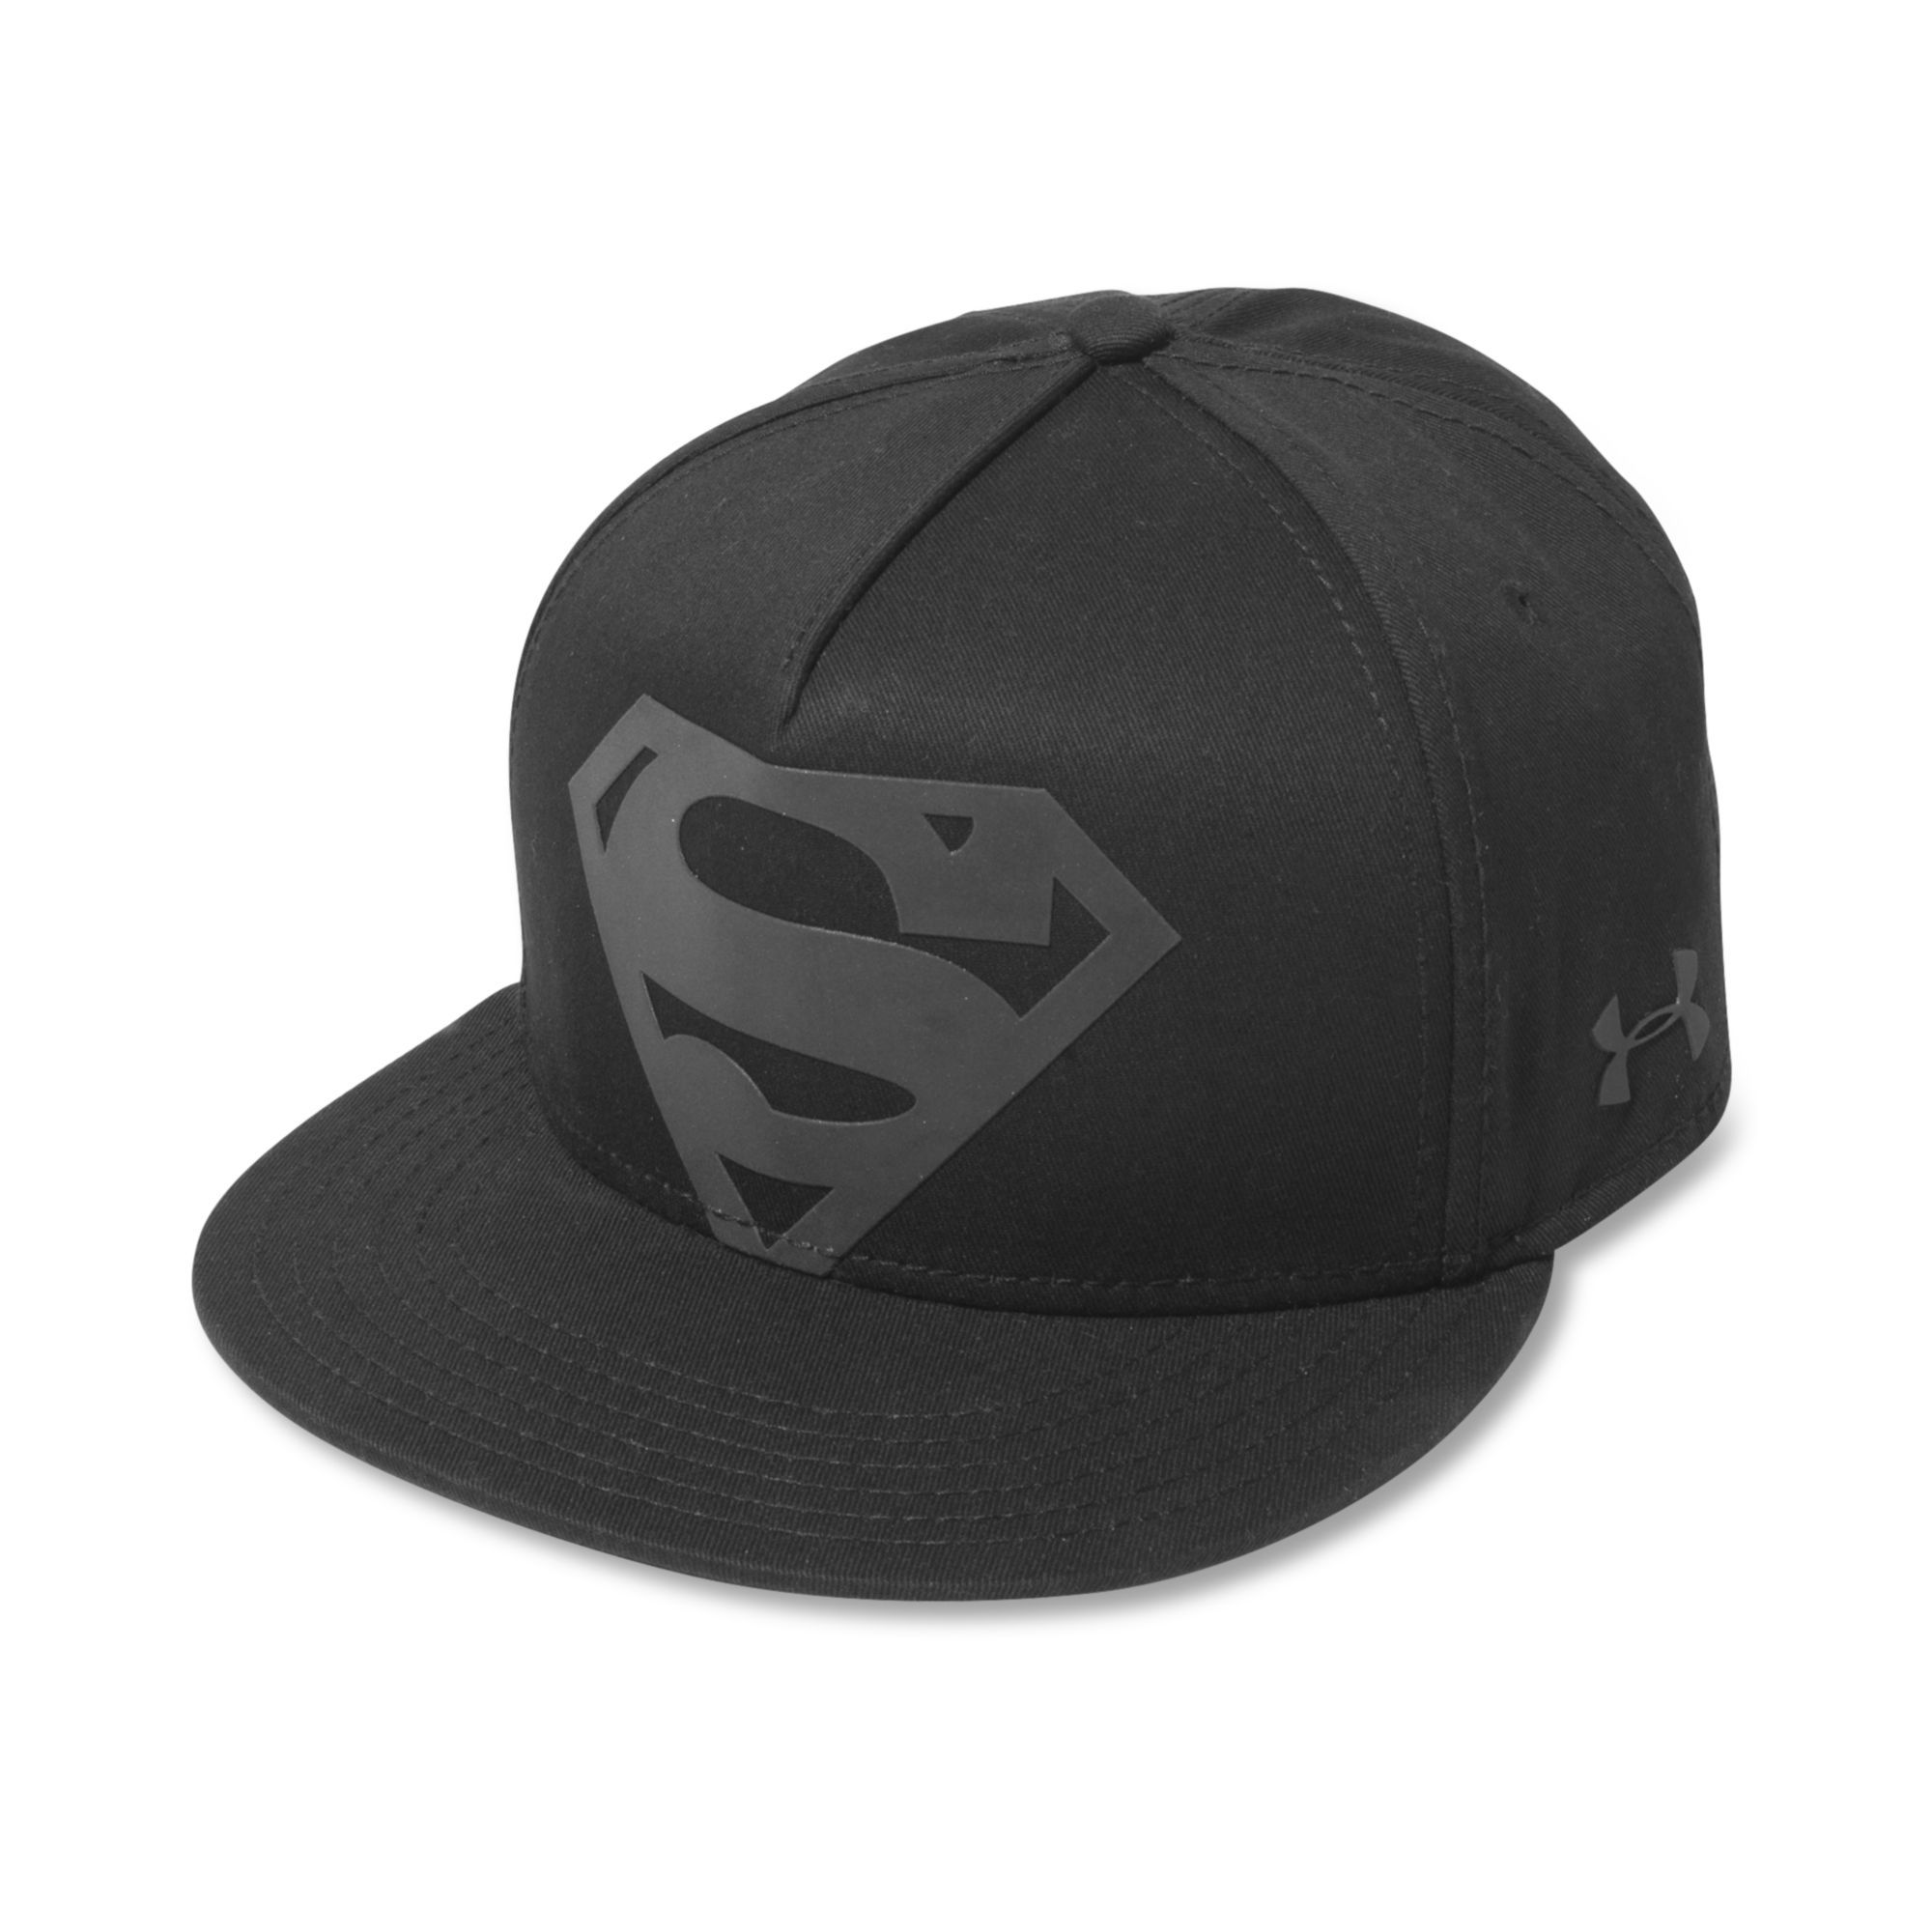 e4f18596e4c ... ebay lyst under armour superman reflective hat in black for men d4580  71319 ...